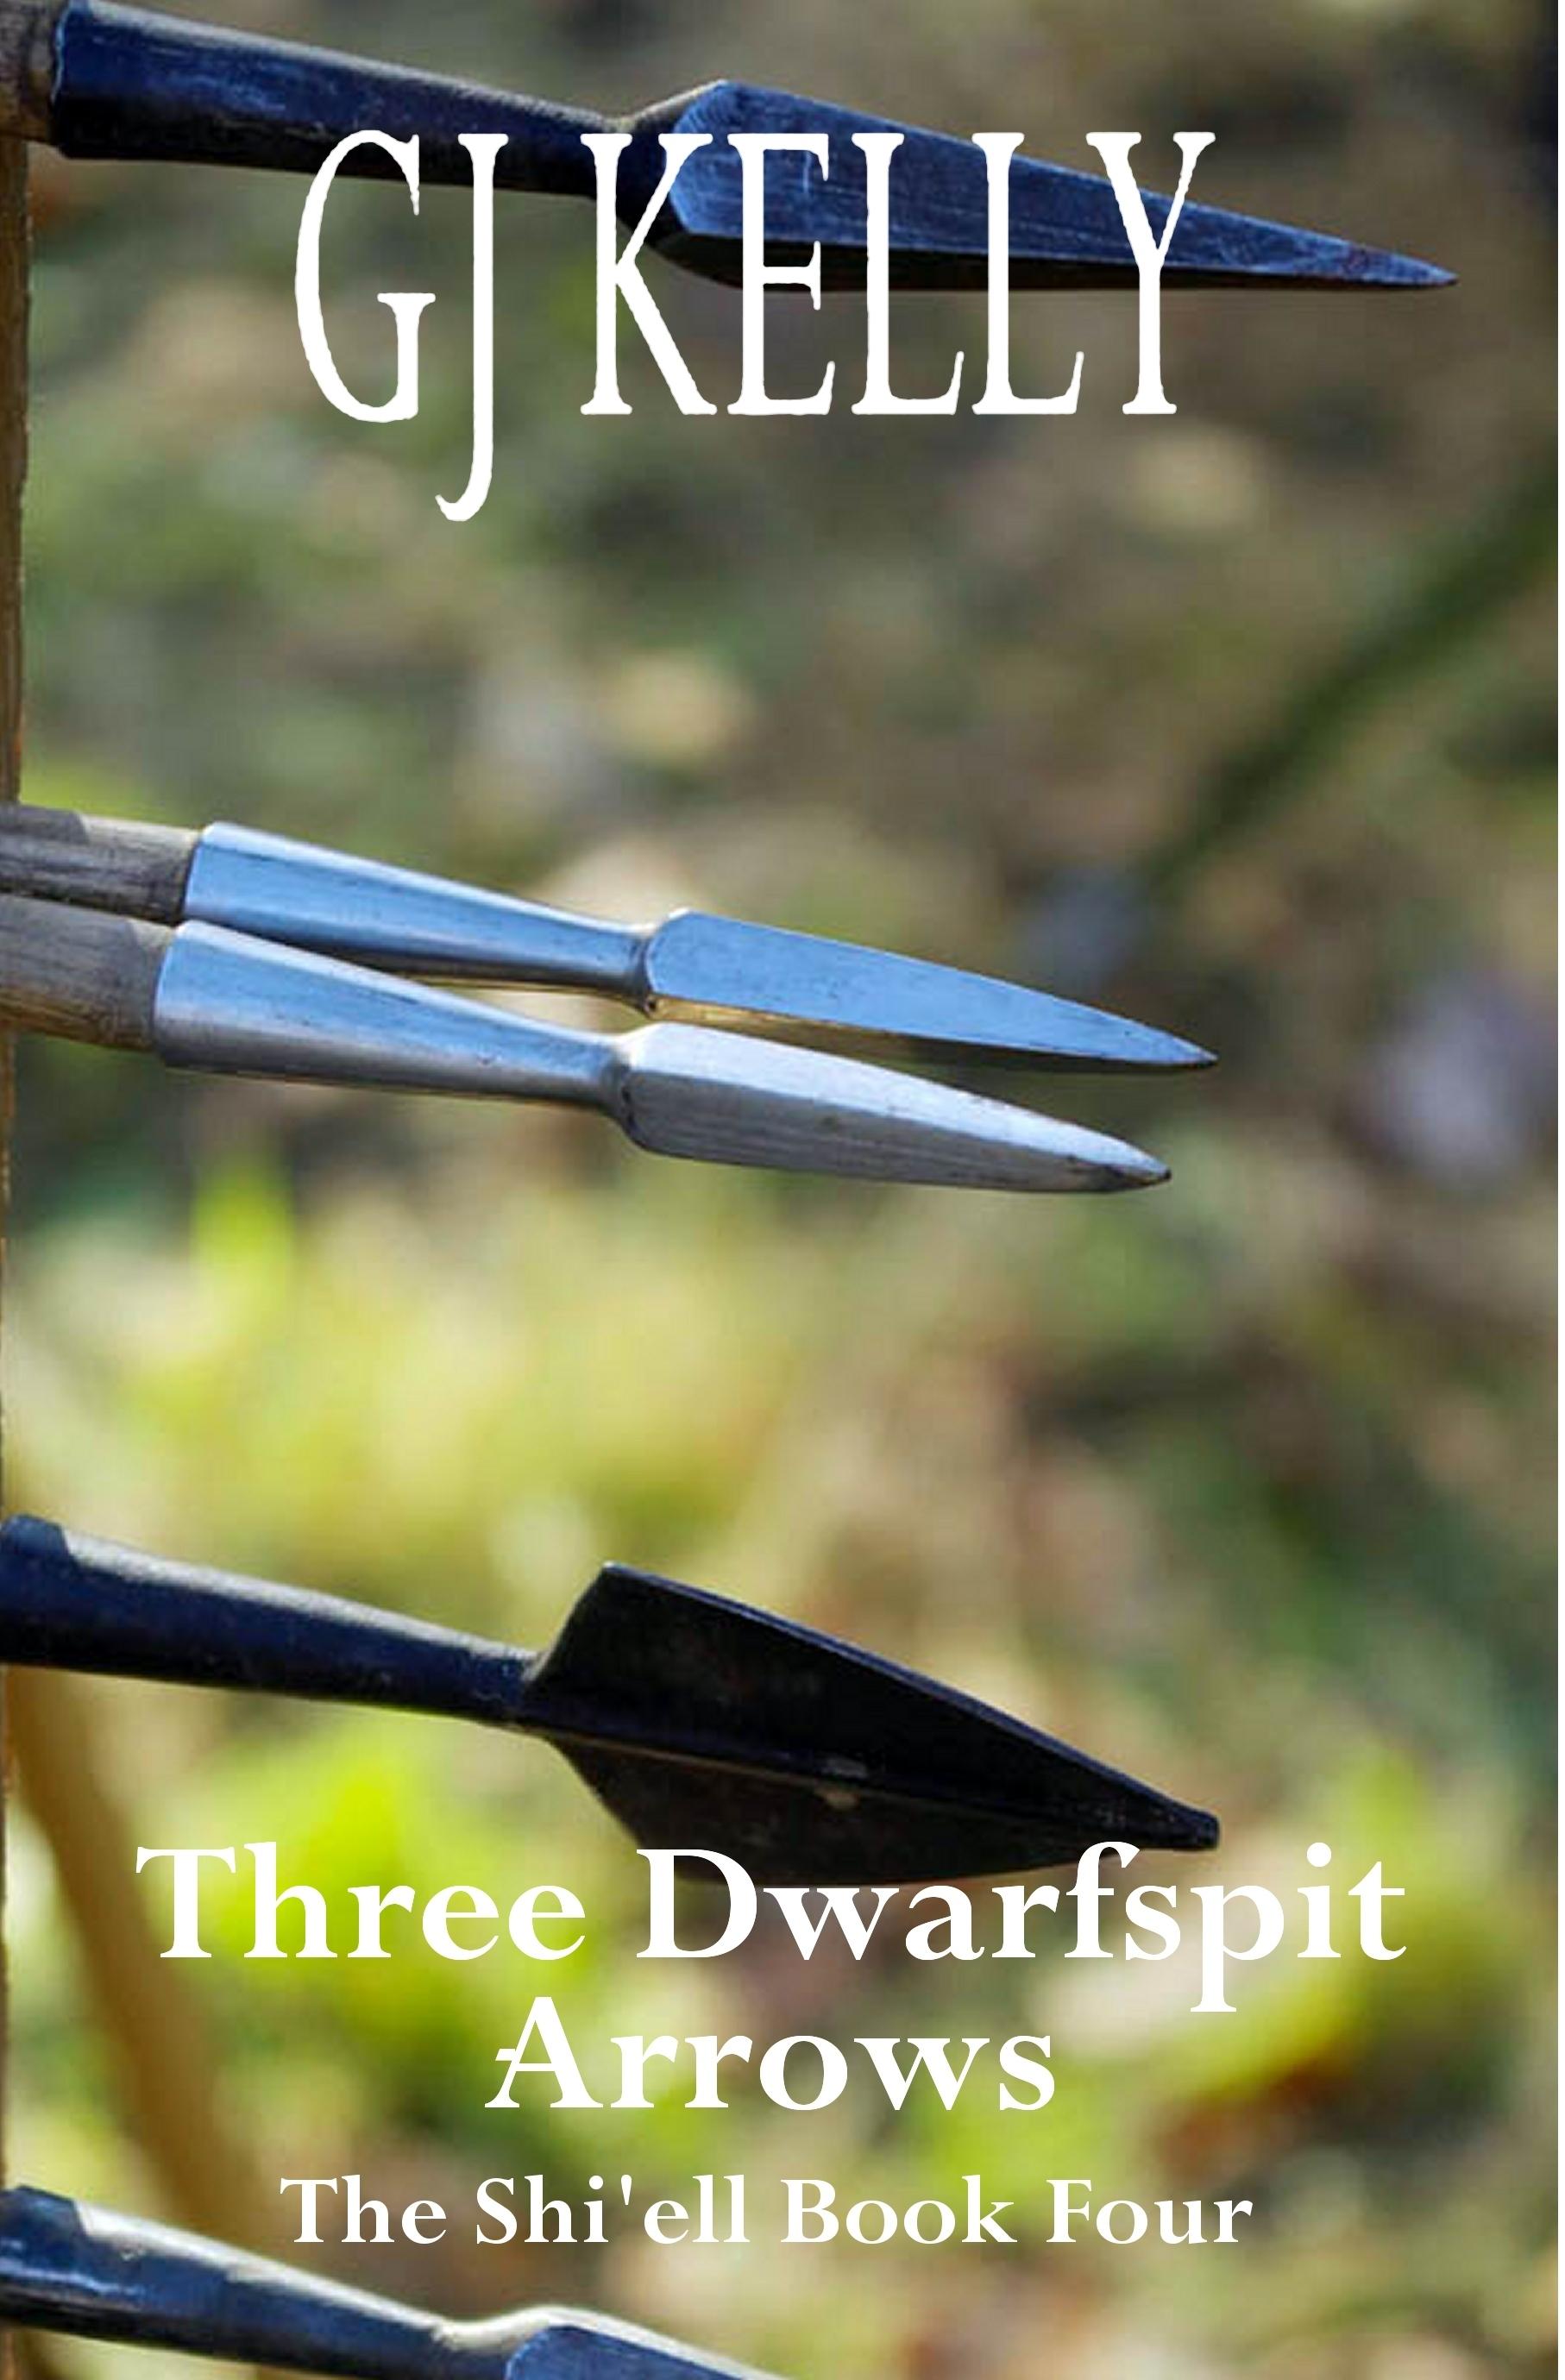 Three Dwarfspit Arrows G.J. Kelly